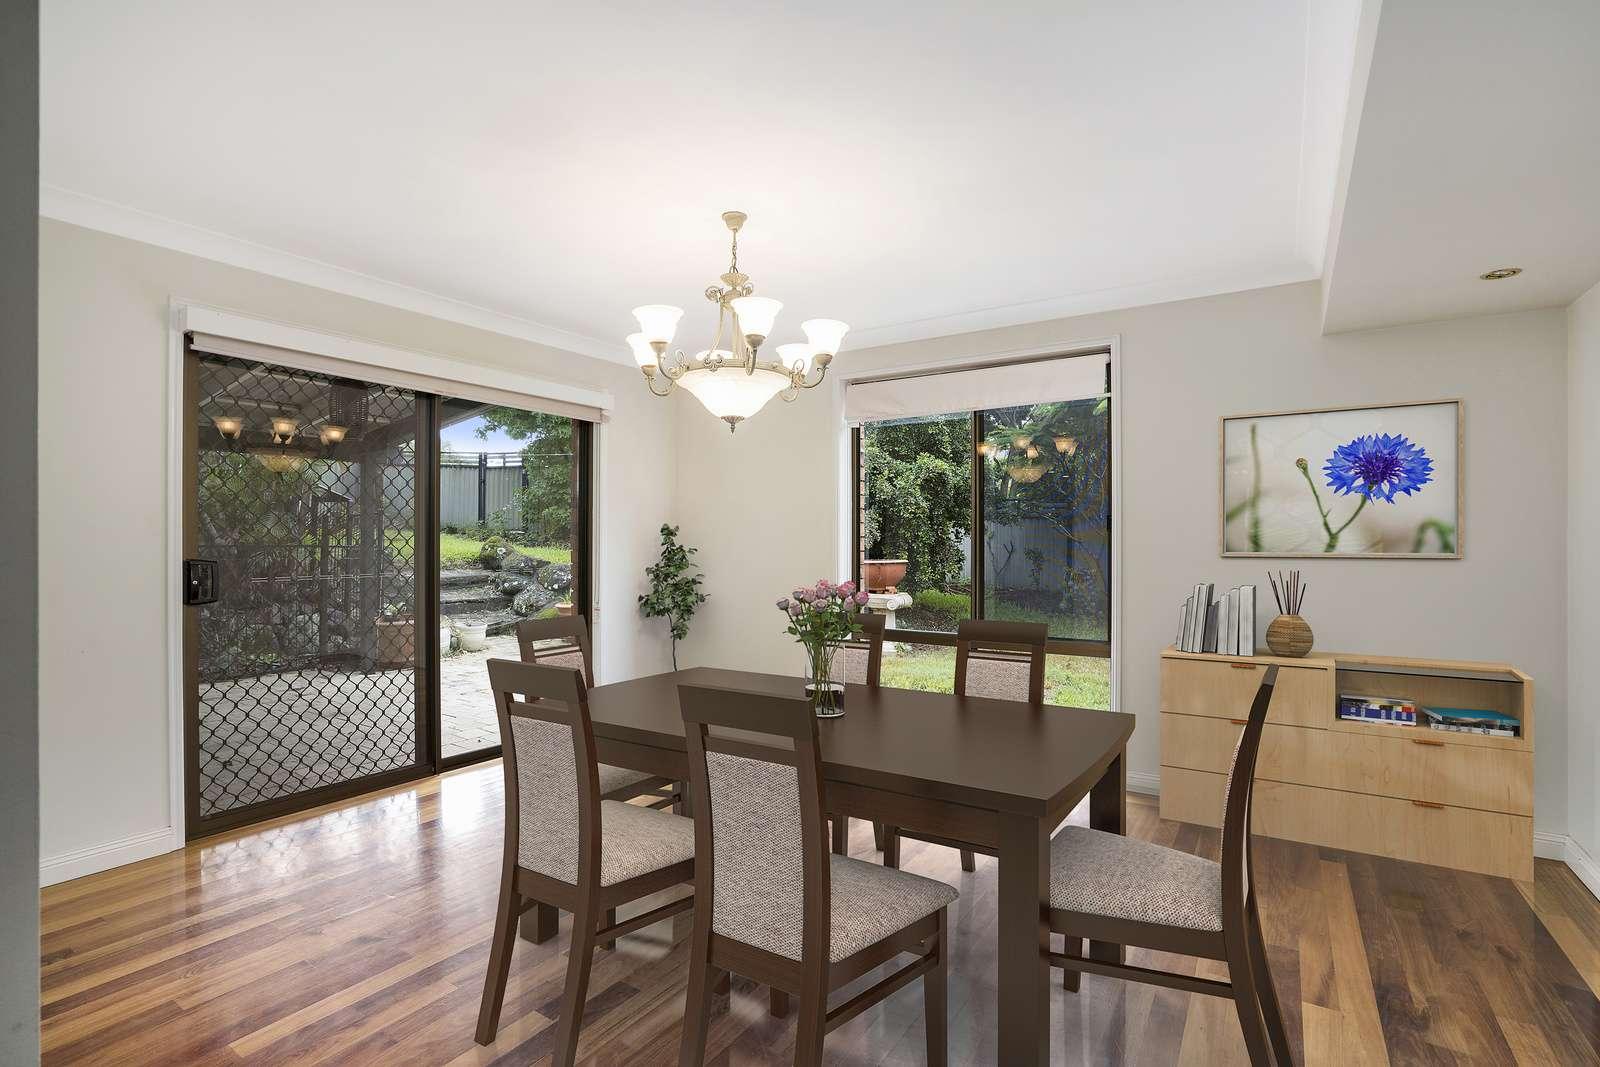 127 Parkwood Boulevard, Parkwood, QLD 4214